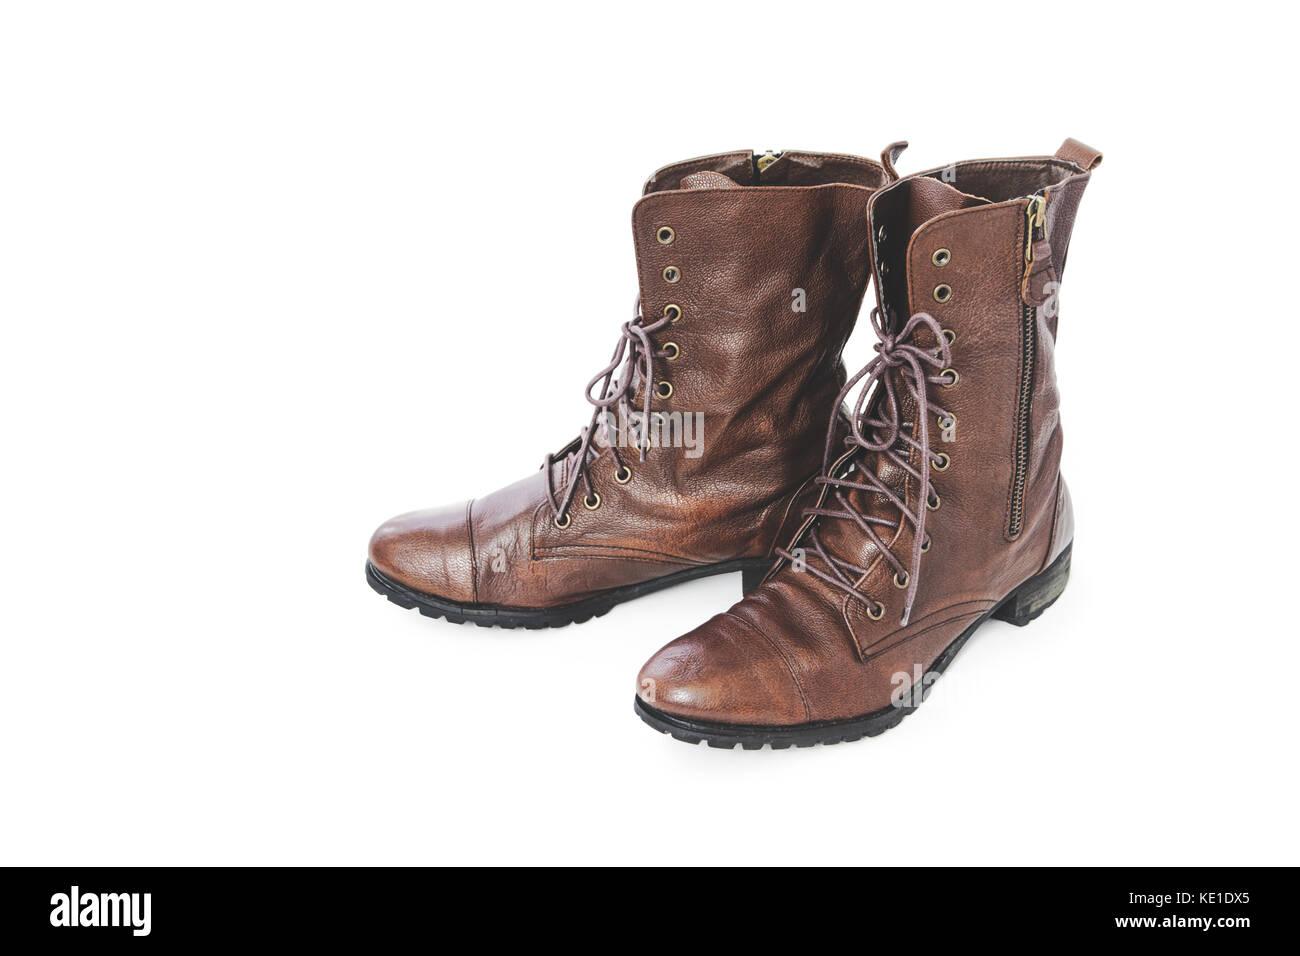 c344e2e4ae4 Second Hand Classic Leather Shoes